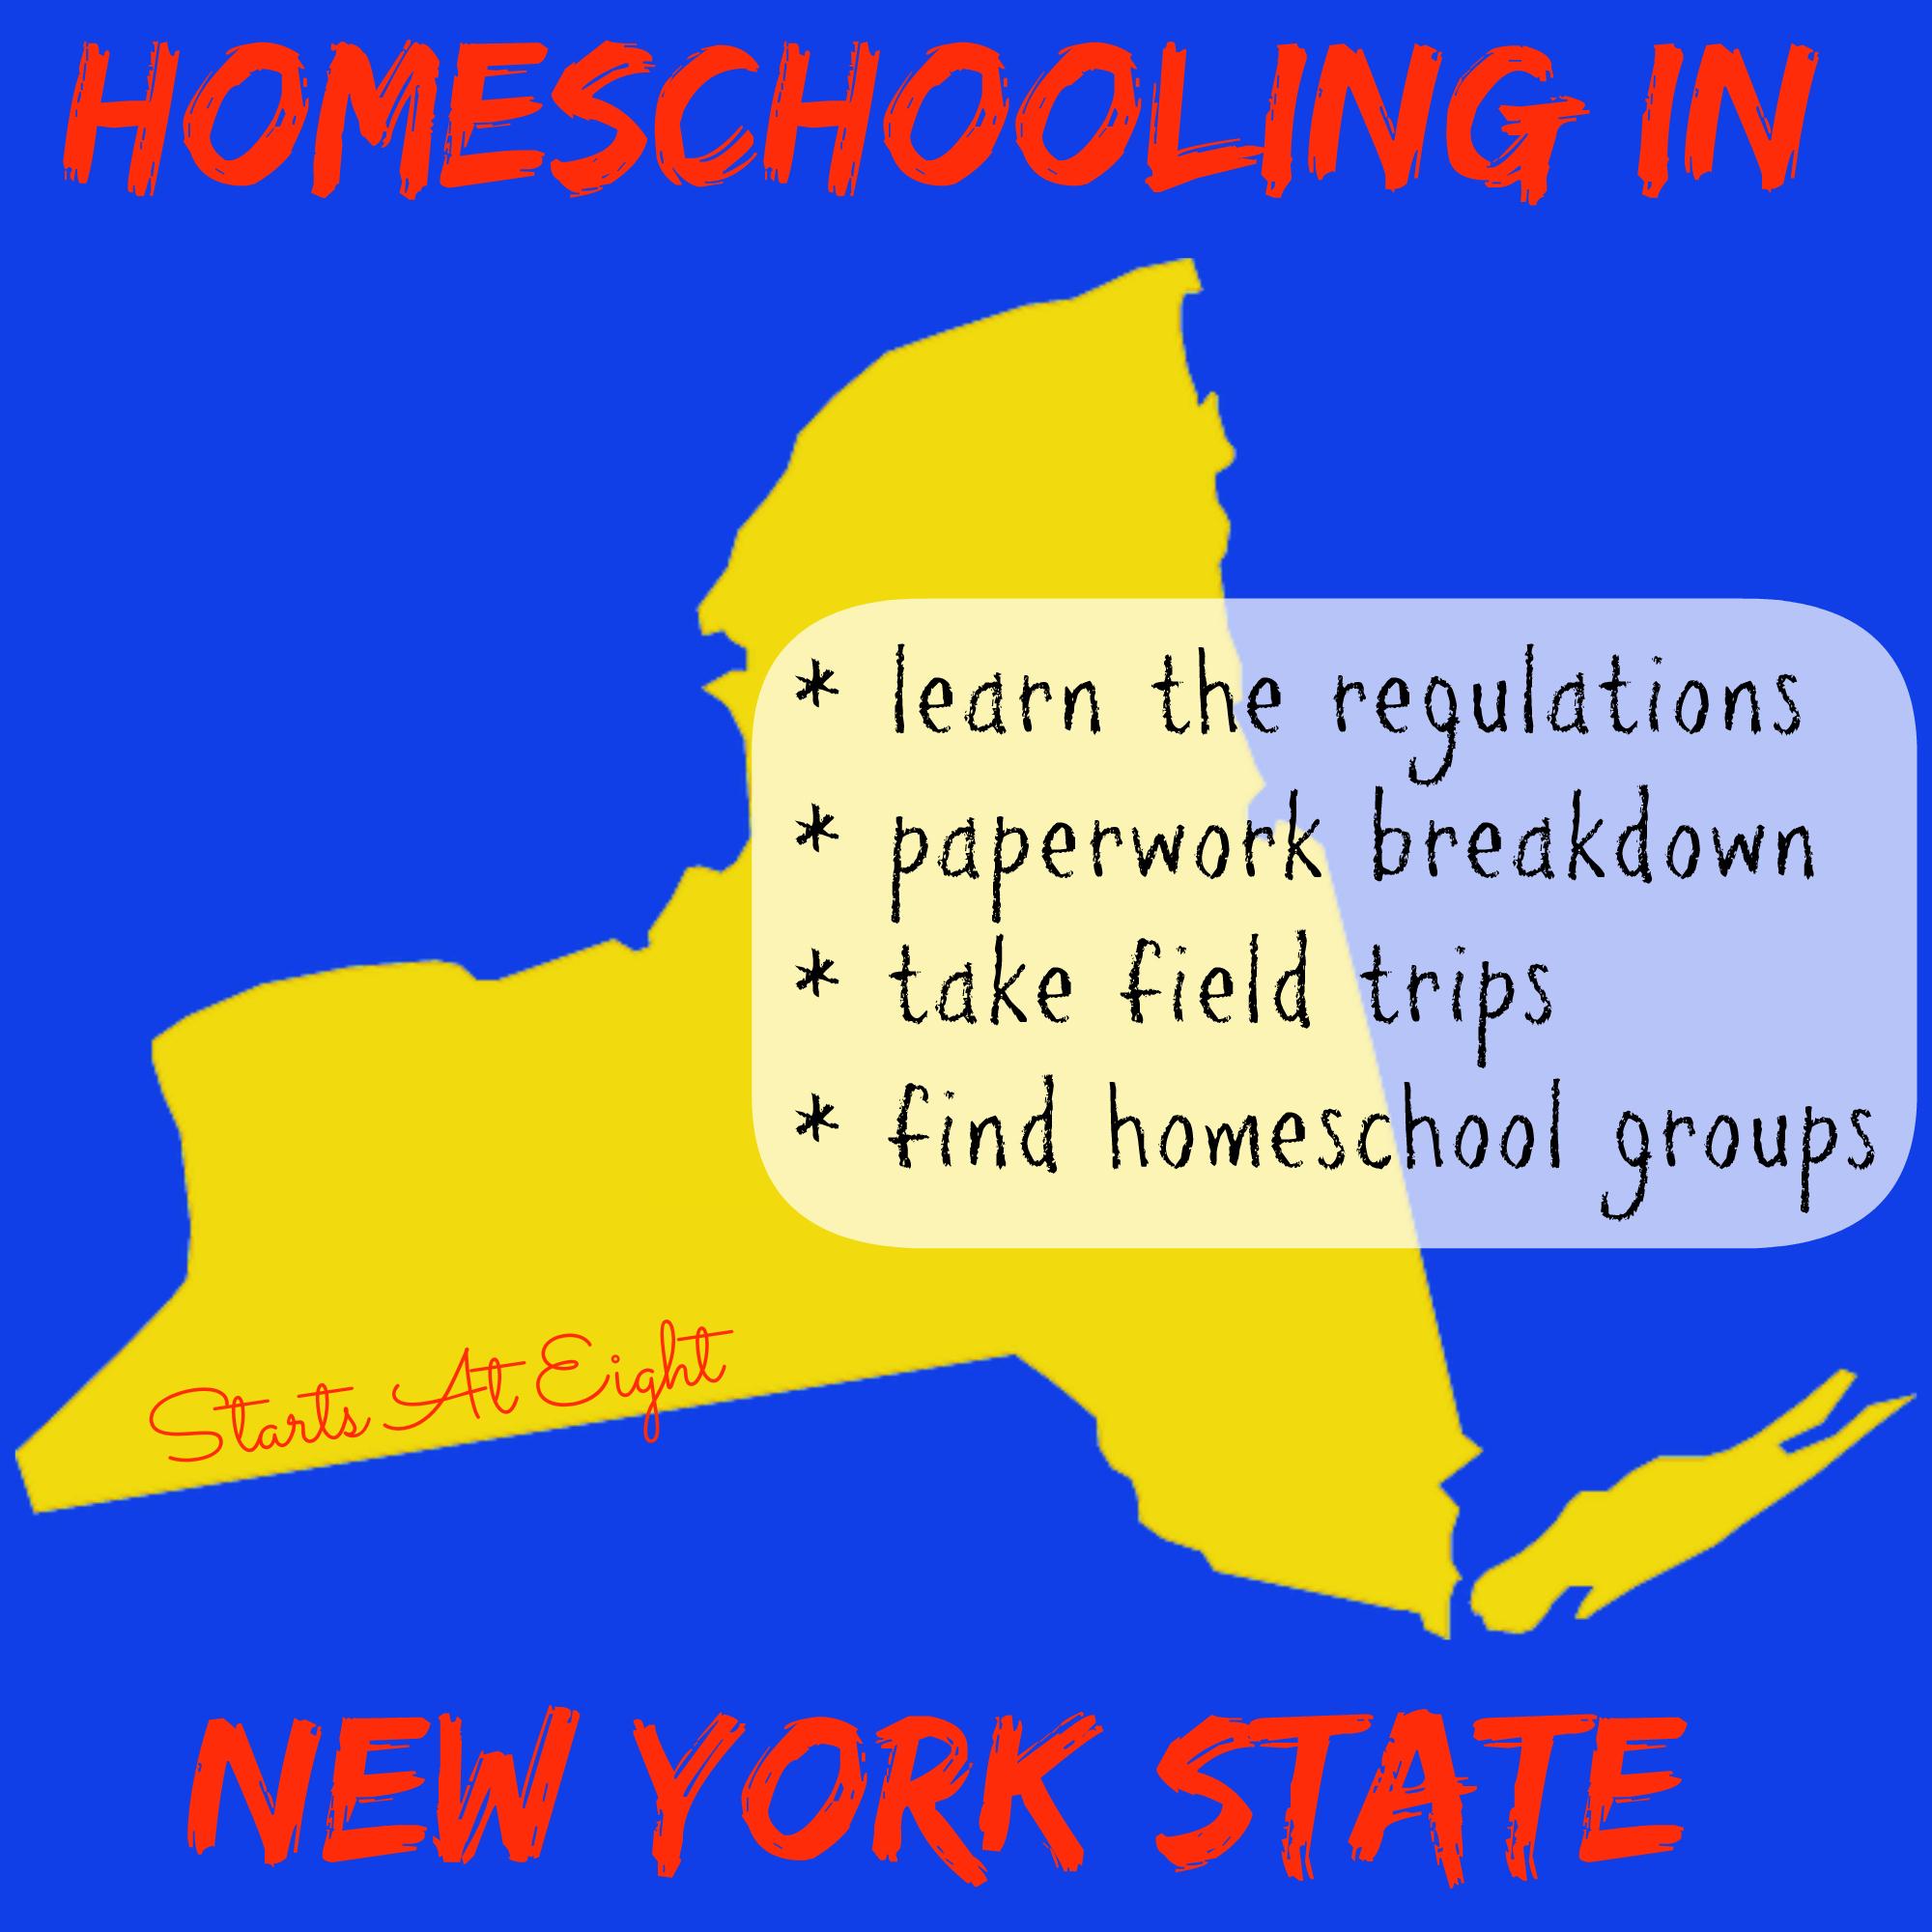 hight resolution of NYS Homeschooling Regulations and Resources - StartsAtEight